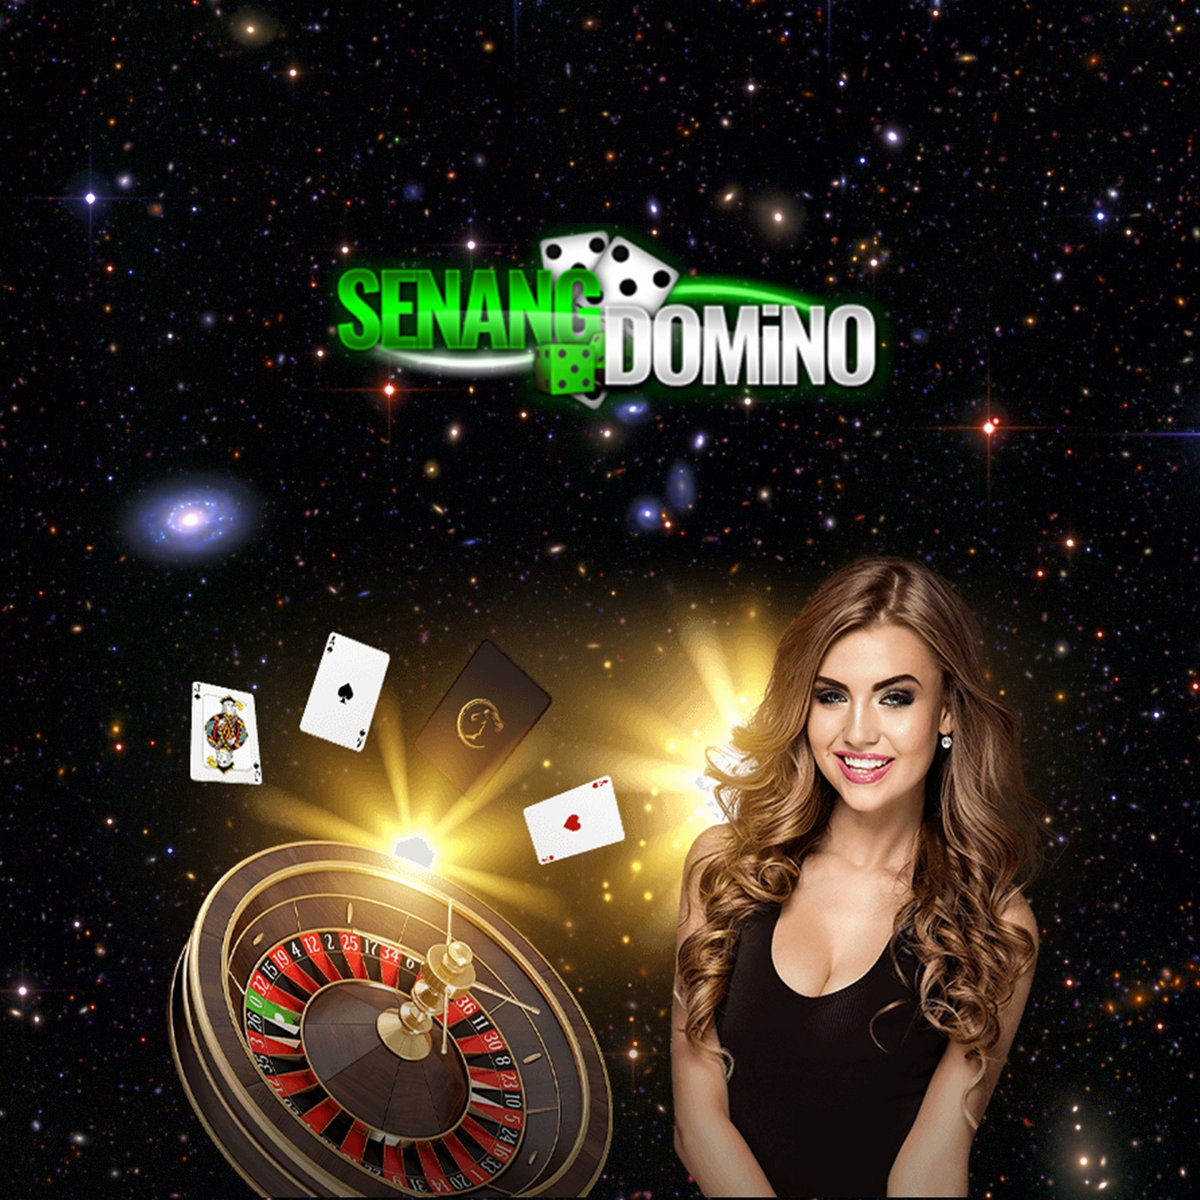 Situs Pkv Poker Online Pkvgames Senangdomino Senang Domino Situs Pkv Pkv Pkv Games Poker Poker Online Domino Qq Bandar Pkv Situs Pkv Poker Online